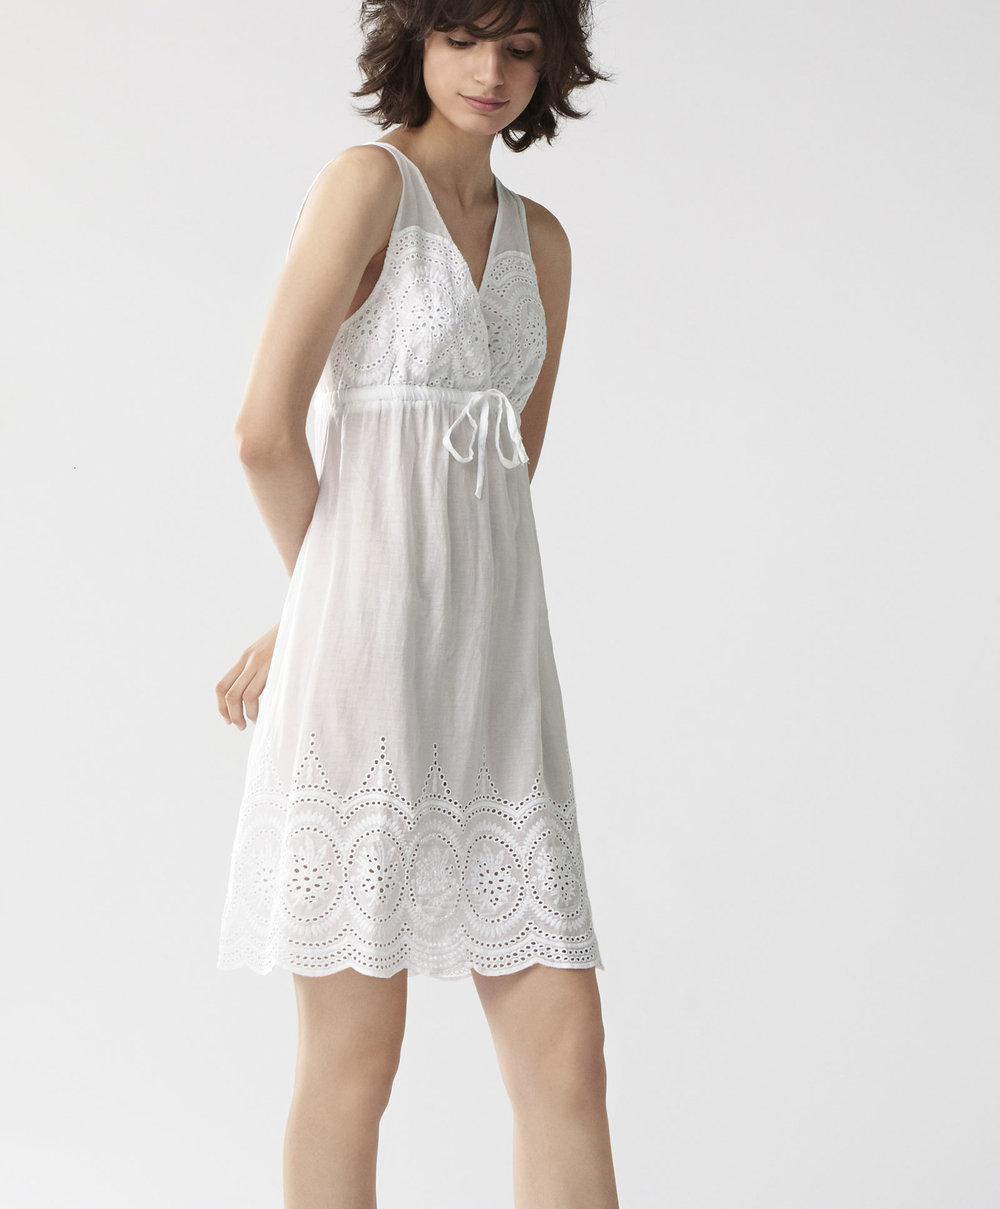 blog-mariage-parisian-inspired-lingerie1936157250_1_1_1.jpg